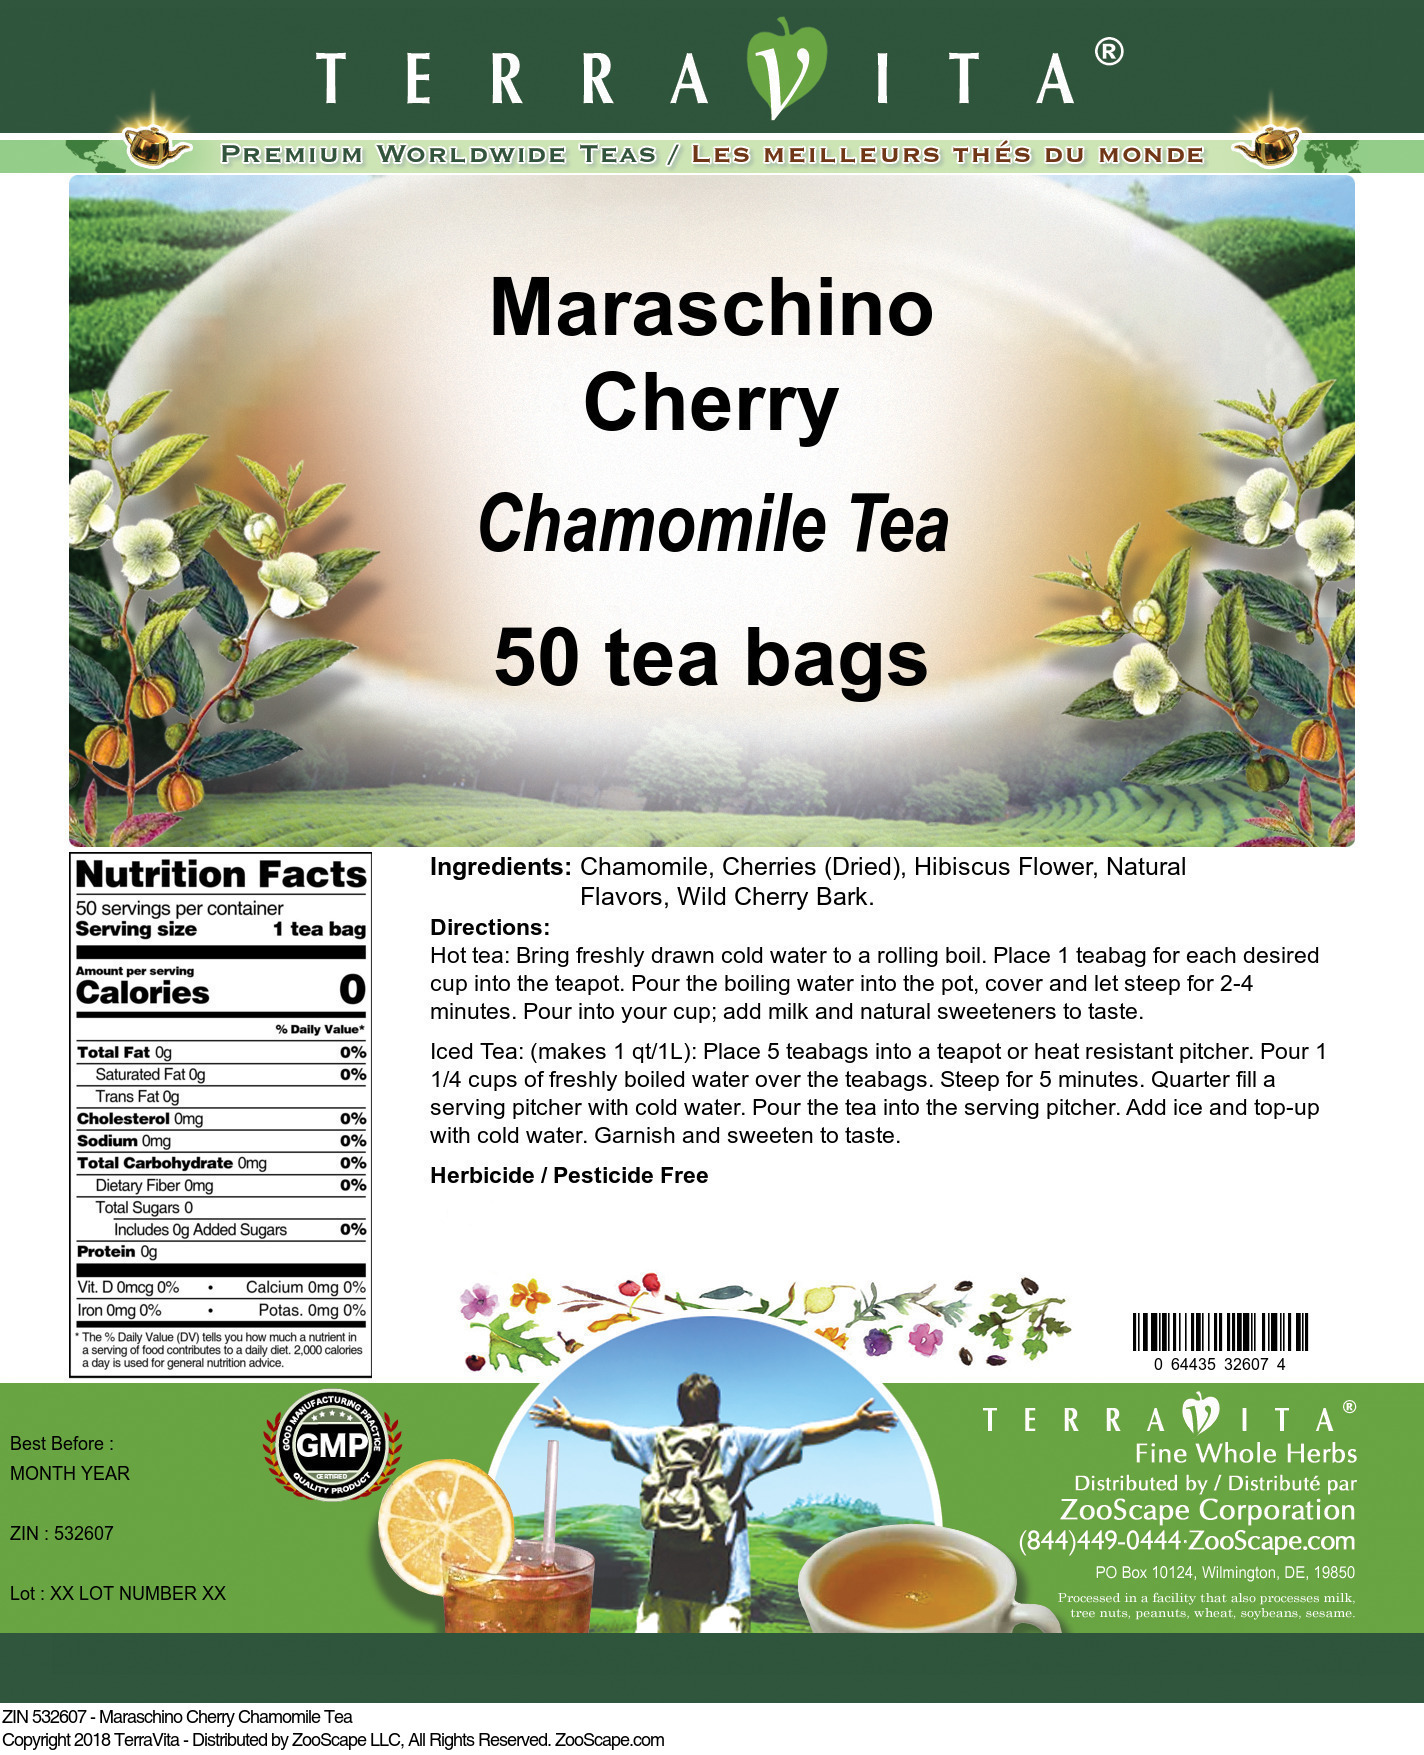 Maraschino Cherry Chamomile Tea